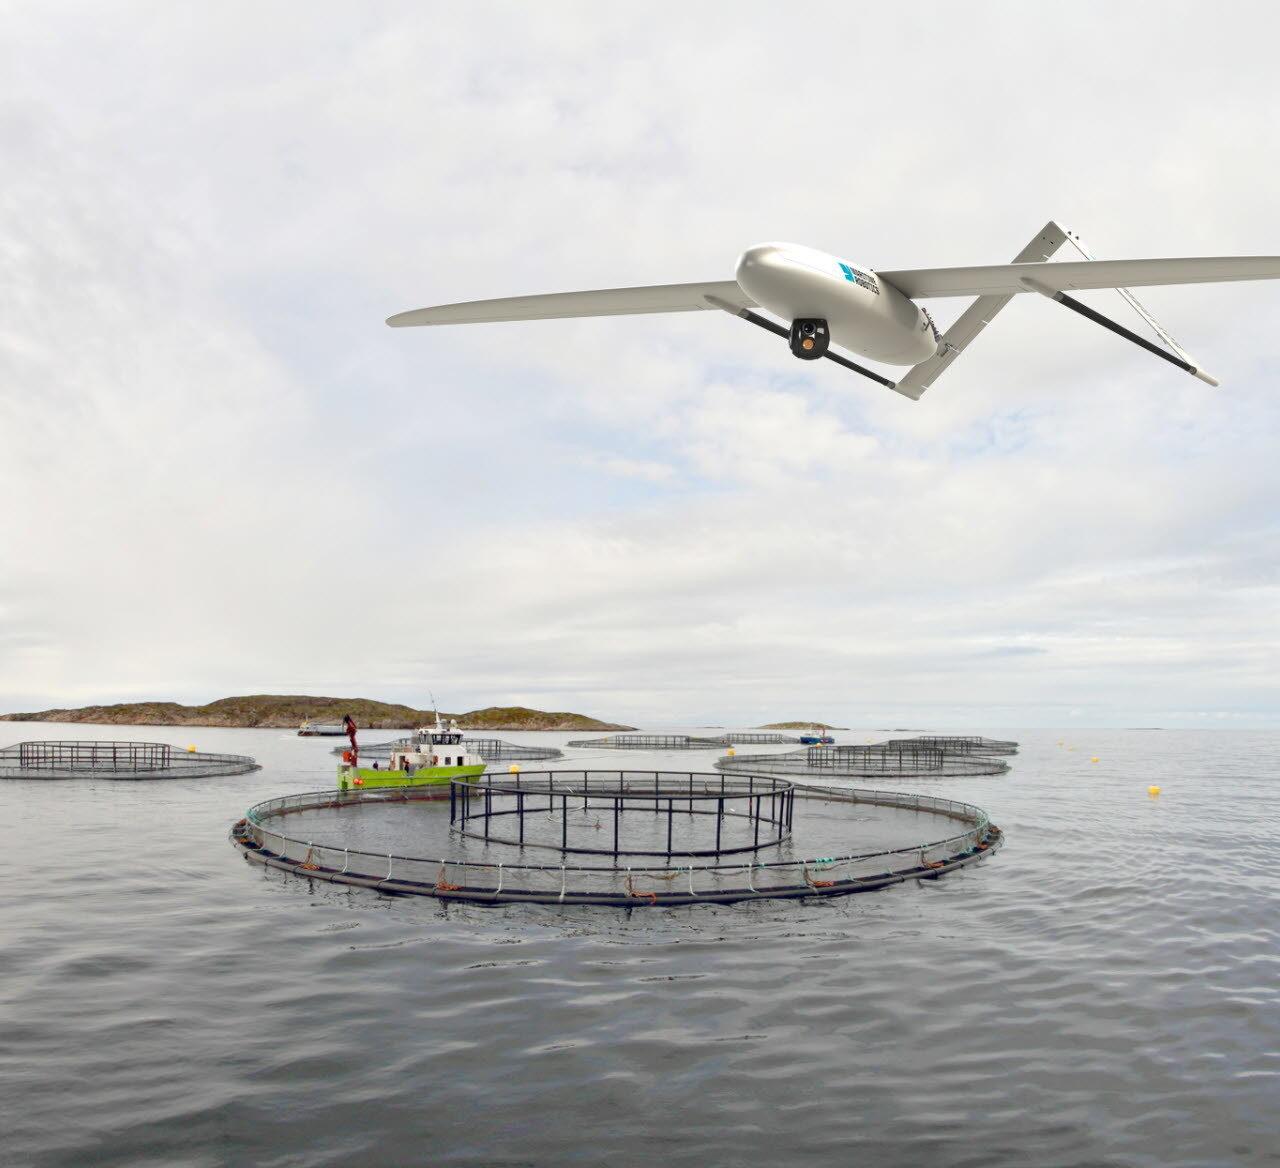 http://nextwavehellas.com/wp-content/uploads/2020/10/aquaculture-1-1280x1168.jpg